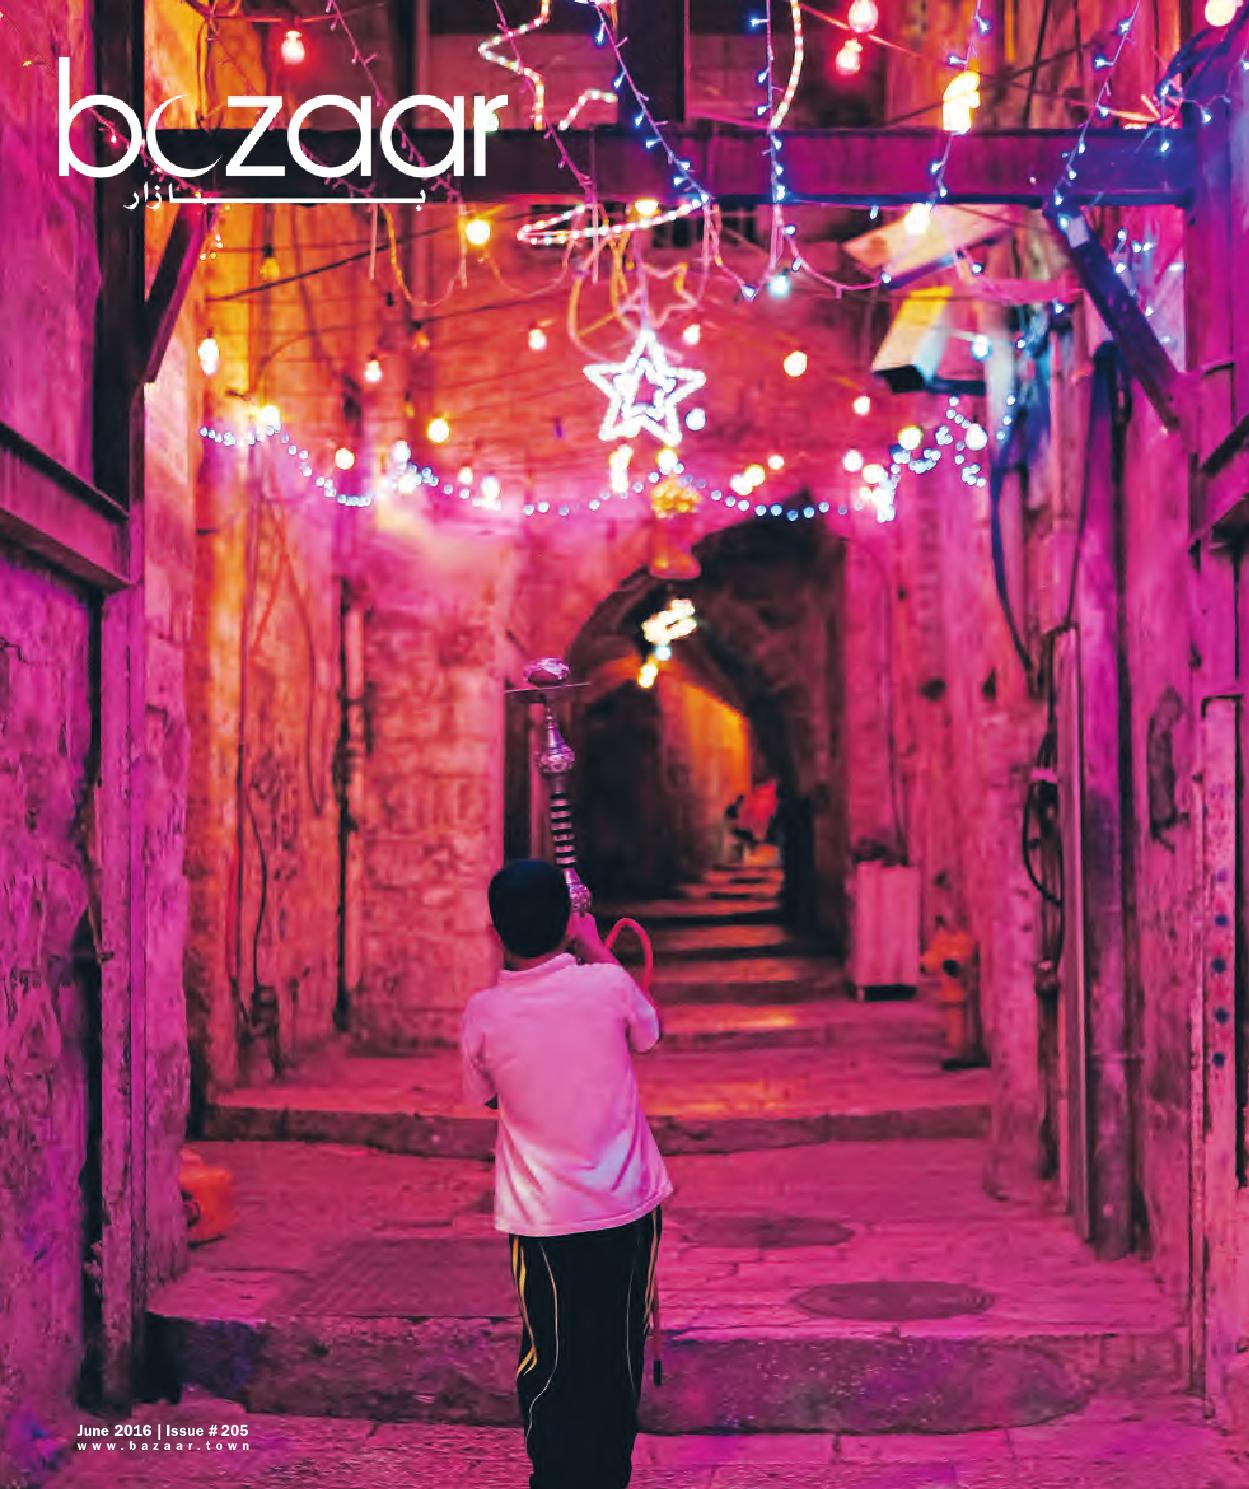 bazaar June 2016 issue by bazaar magazine - issuu